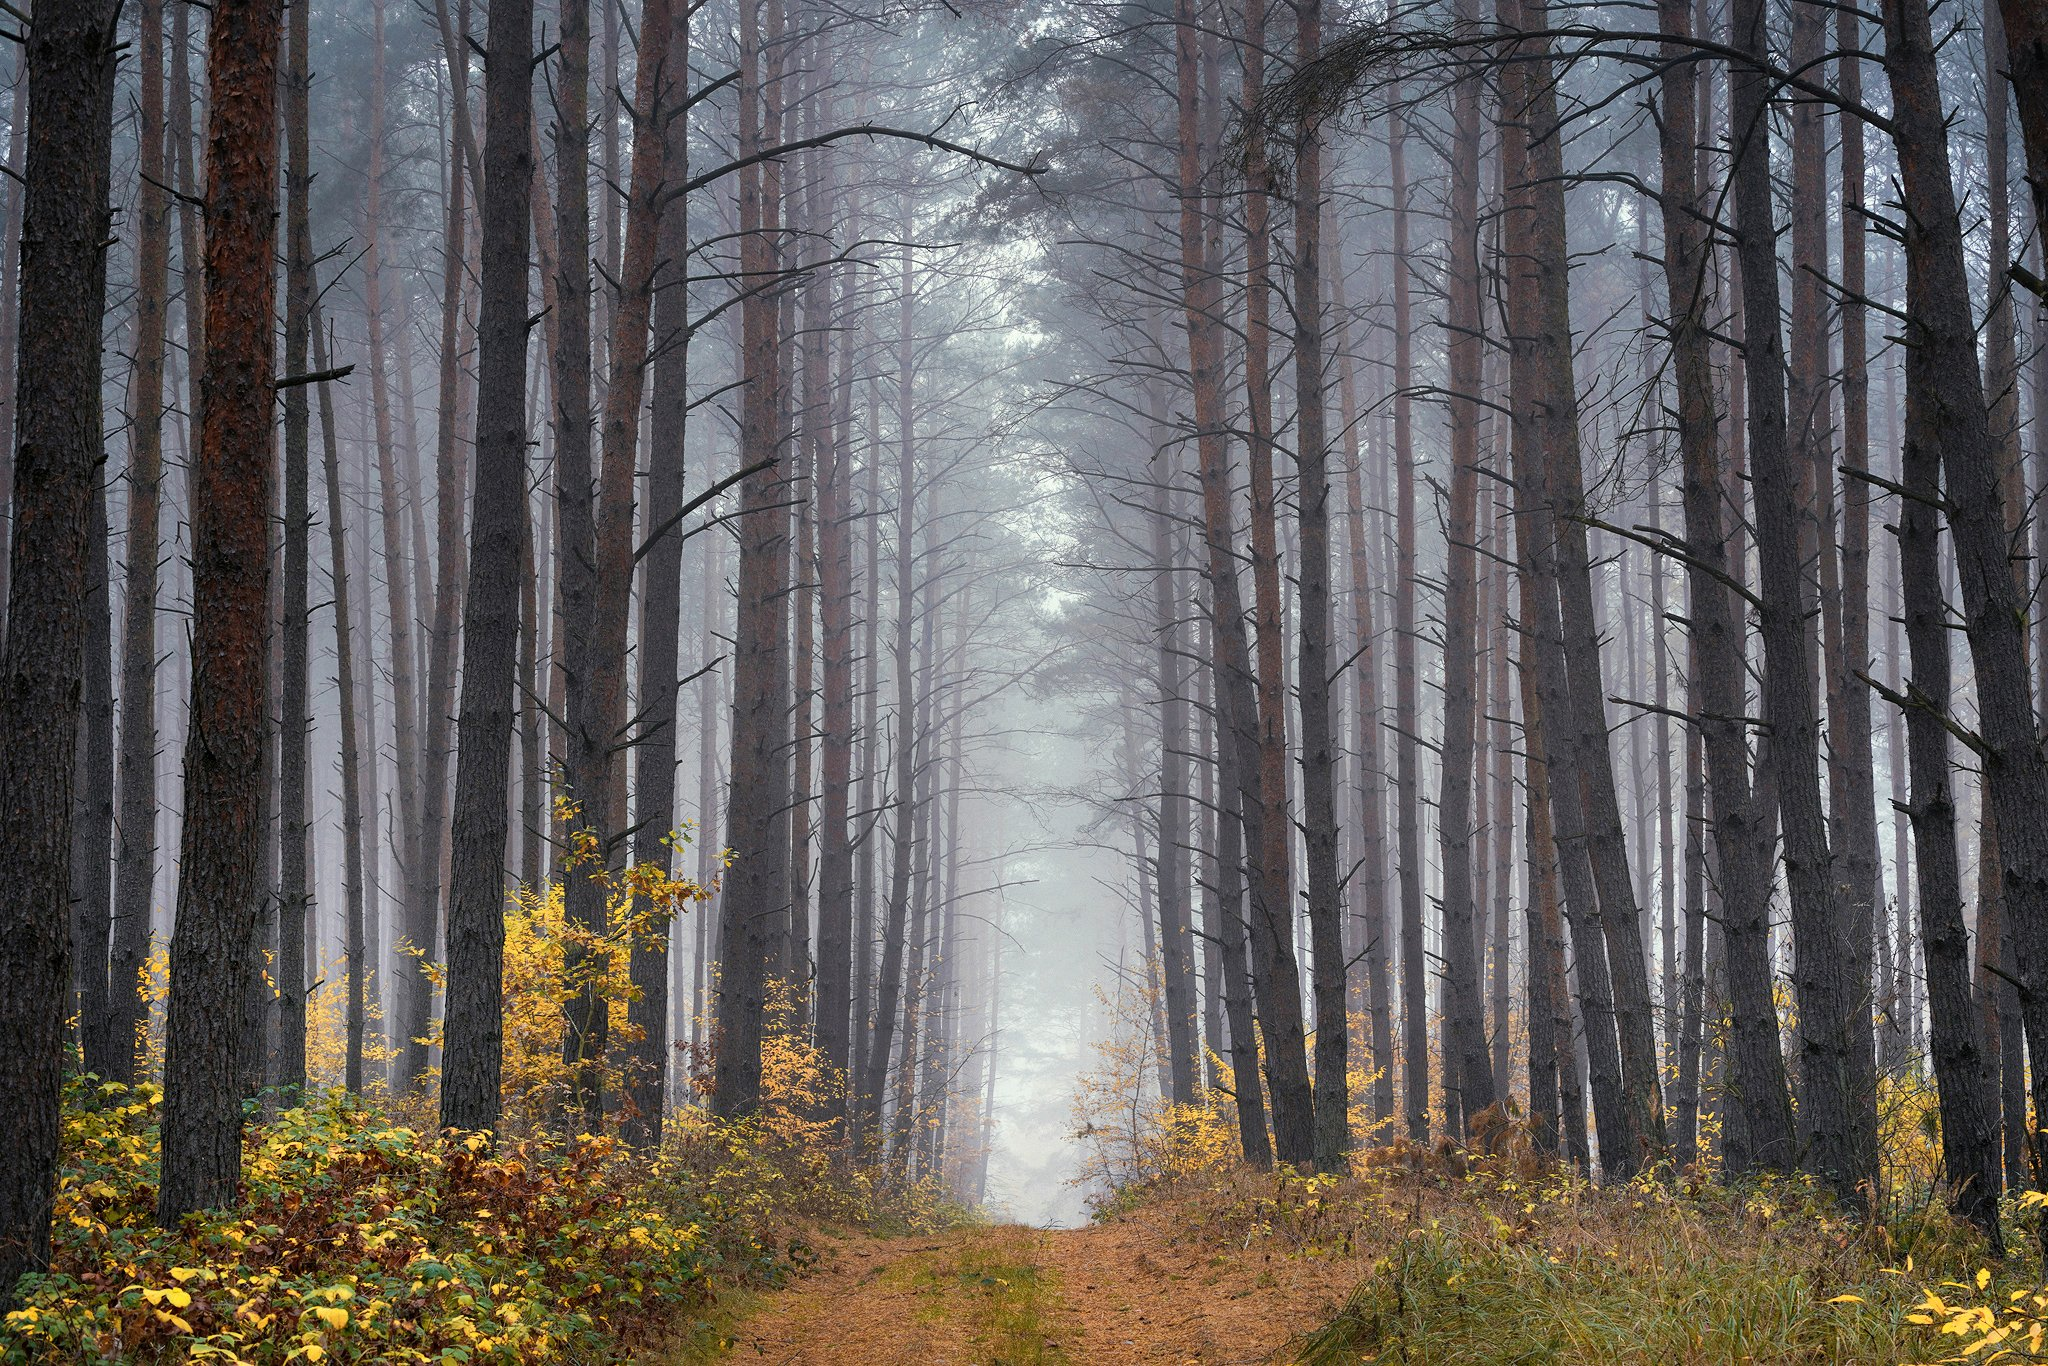 uphill in the forest tree trees magic mist foggy morning path road dranikowski fog autumn fall, Radoslaw Dranikowski